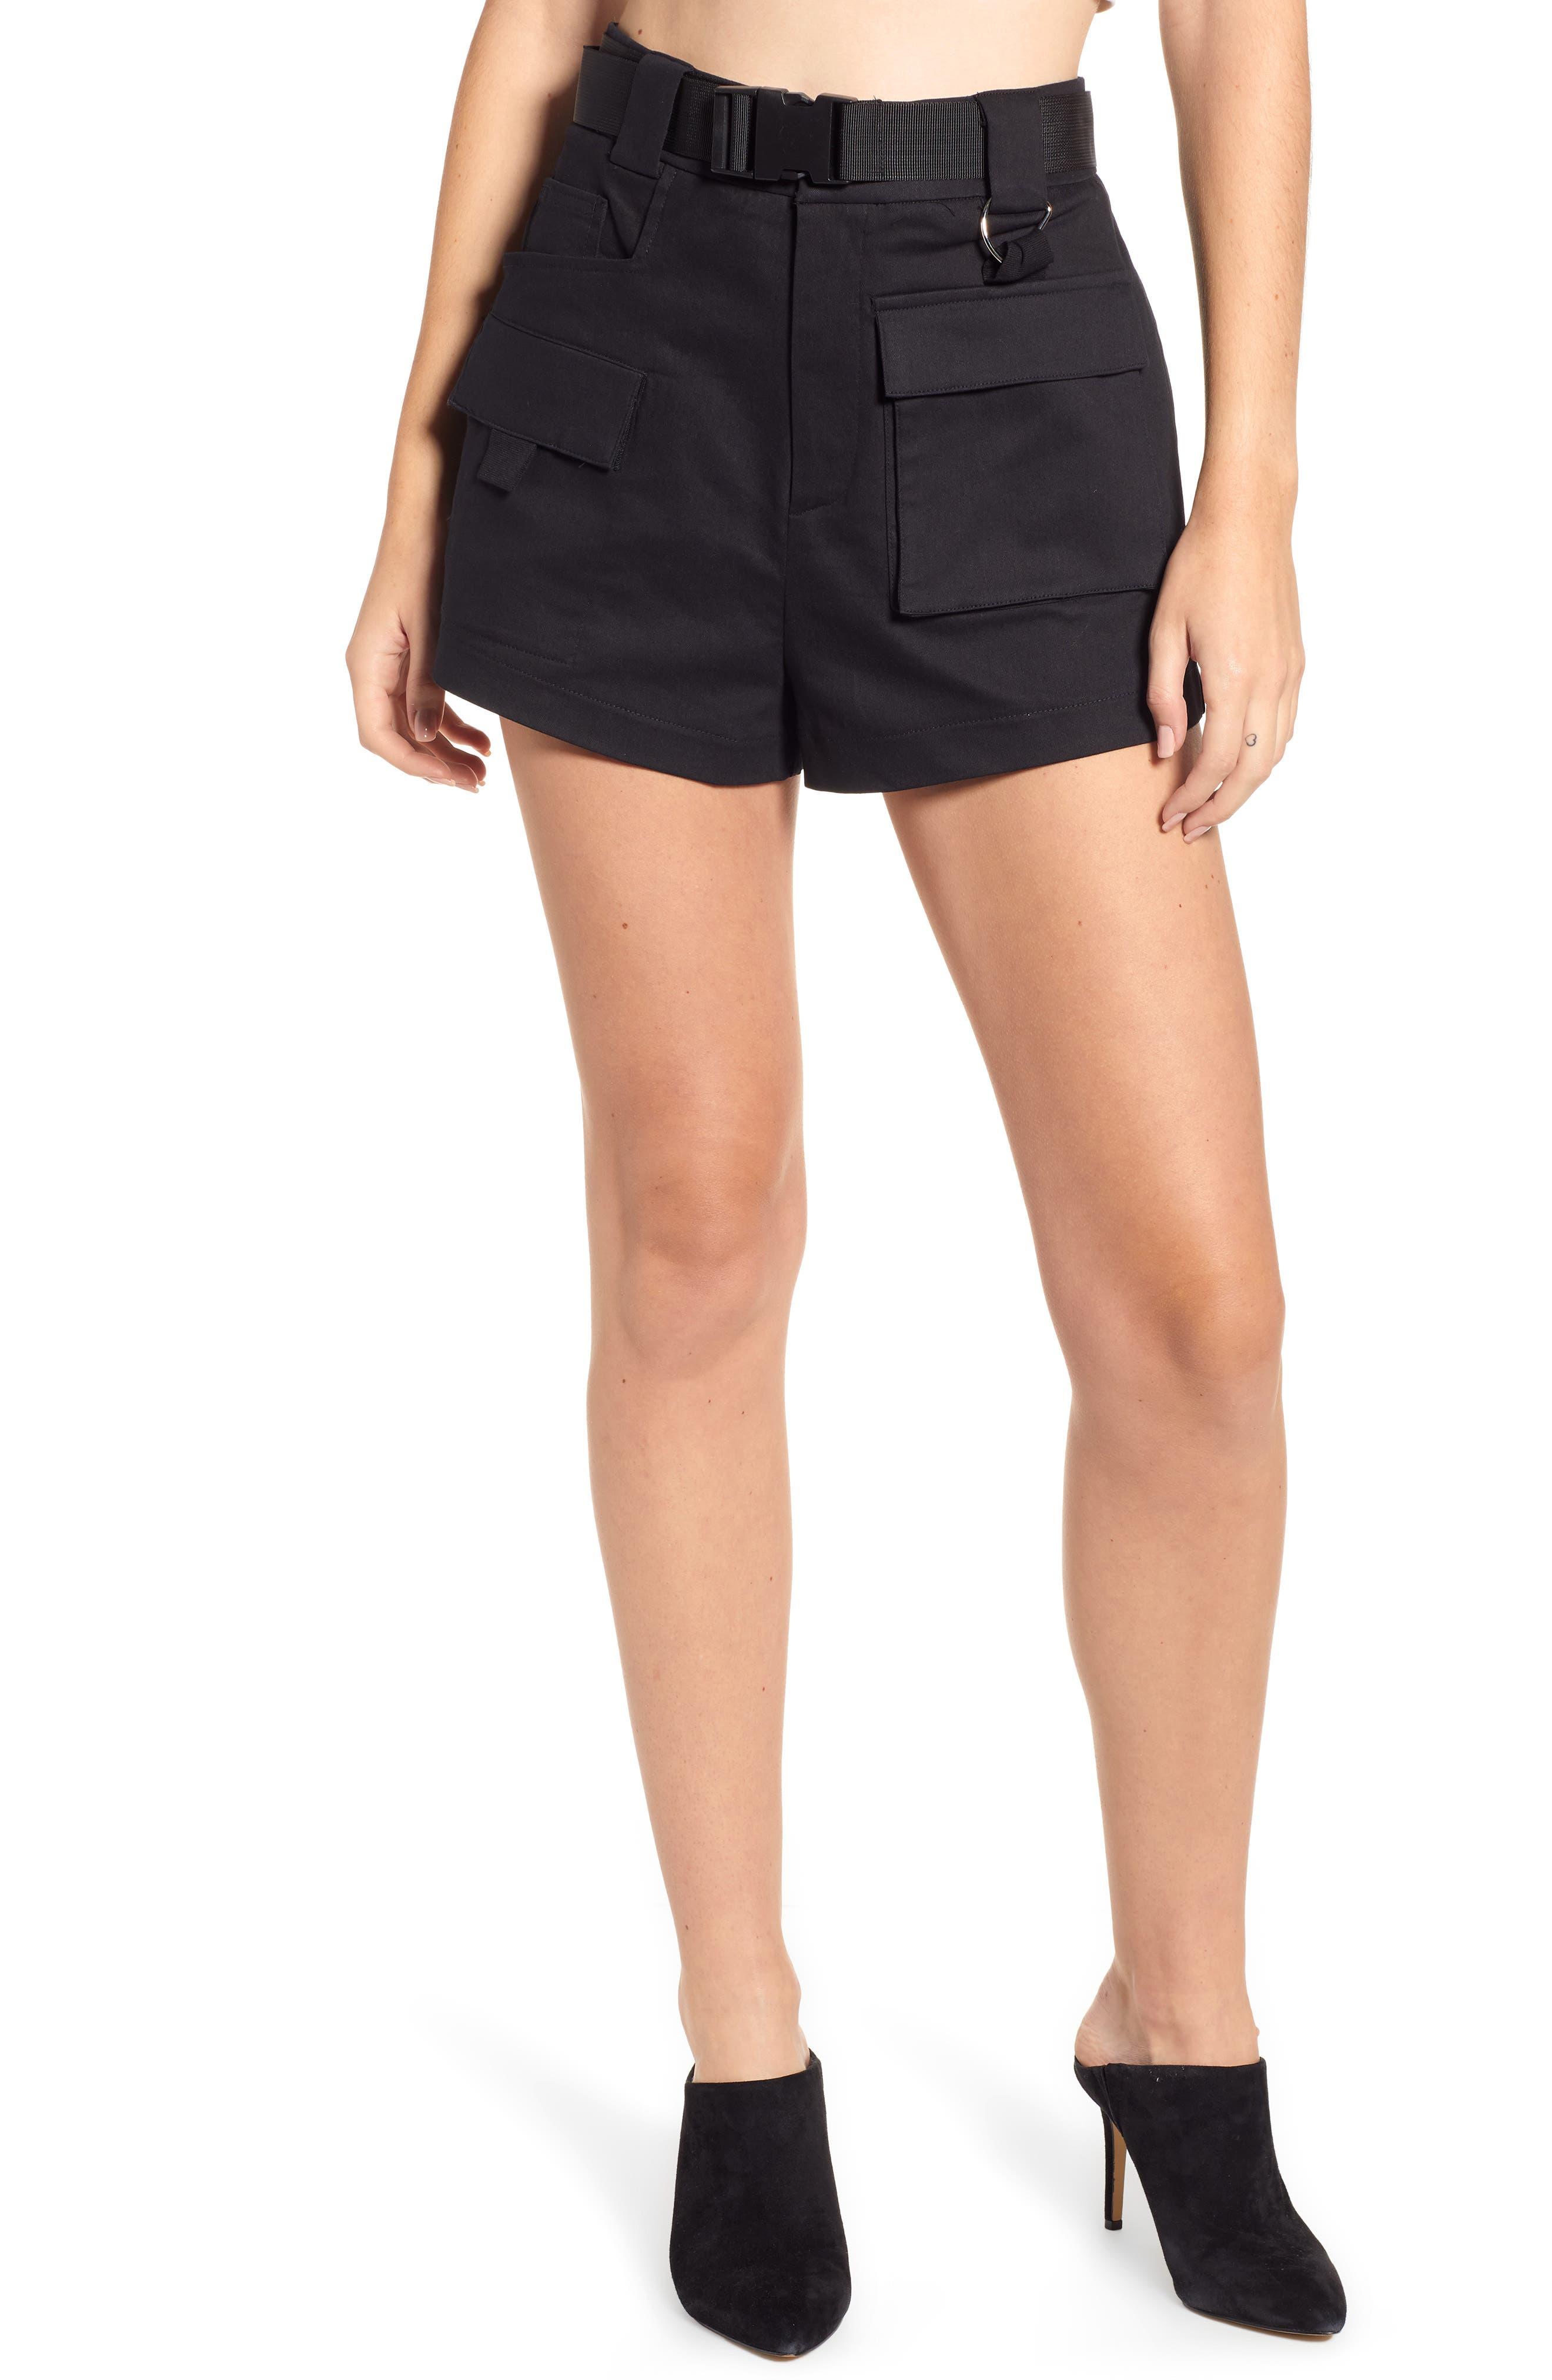 I.AM.GIA I.Am. Gia Harper Shorts in Black